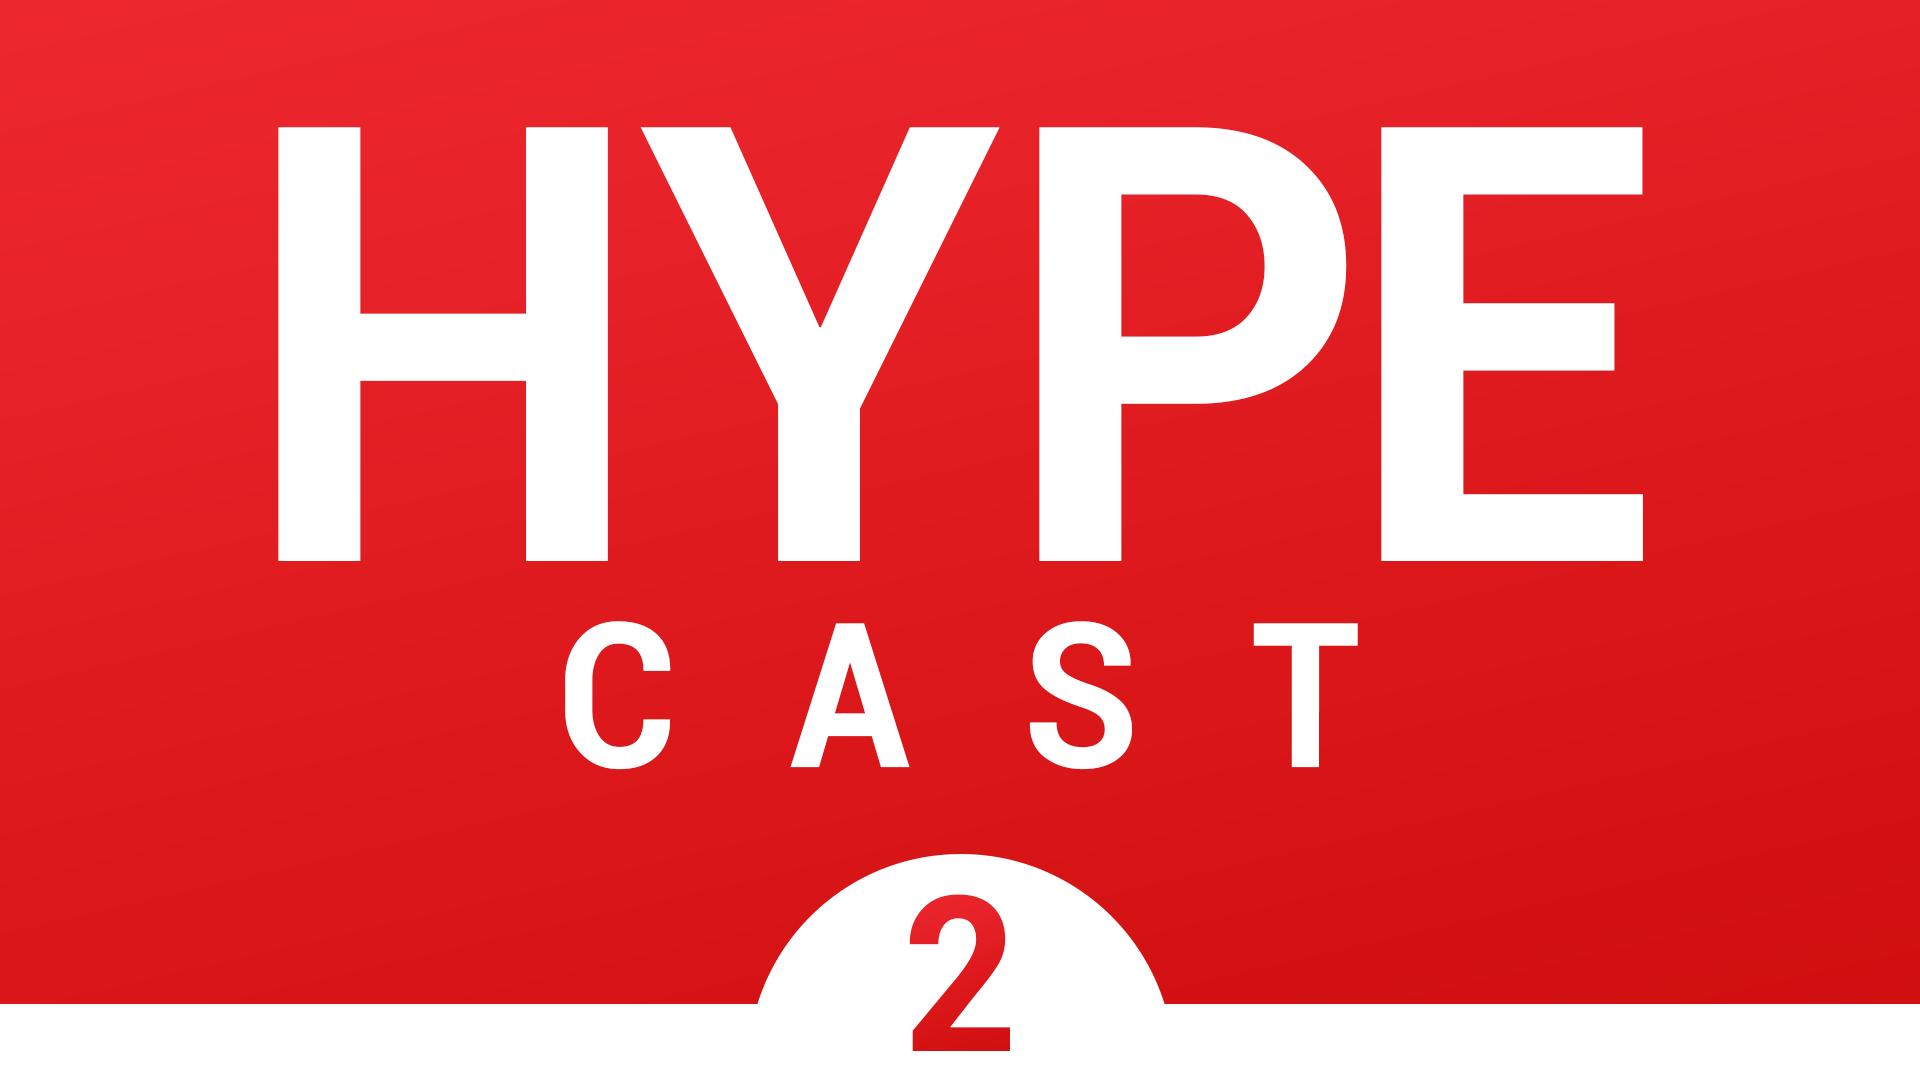 [NTH] Hype Cast #2 (Mini Consoles)